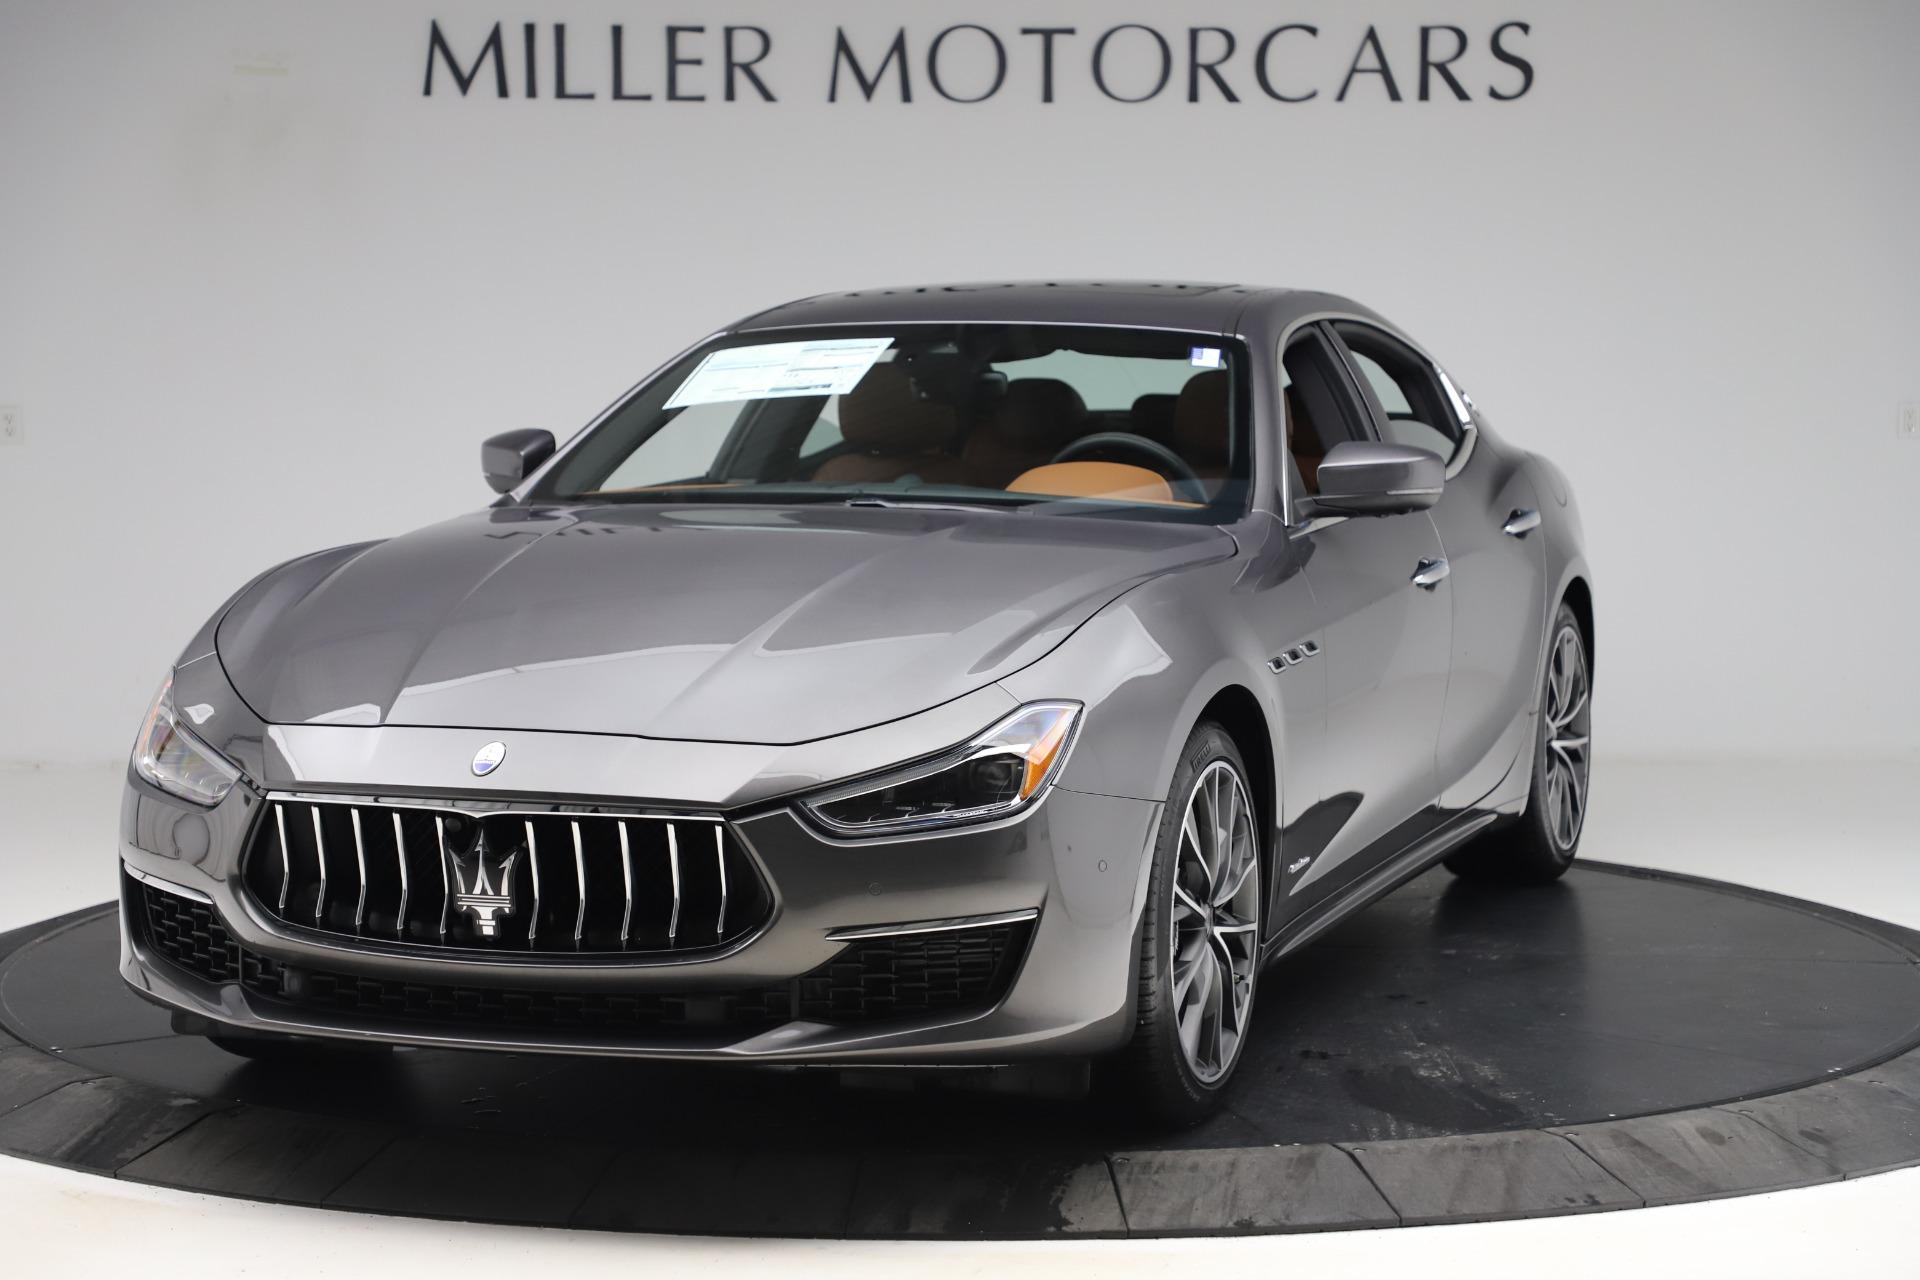 New 2019 Maserati Ghibli S Q4 GranLusso for sale $98,095 at McLaren Greenwich in Greenwich CT 06830 1